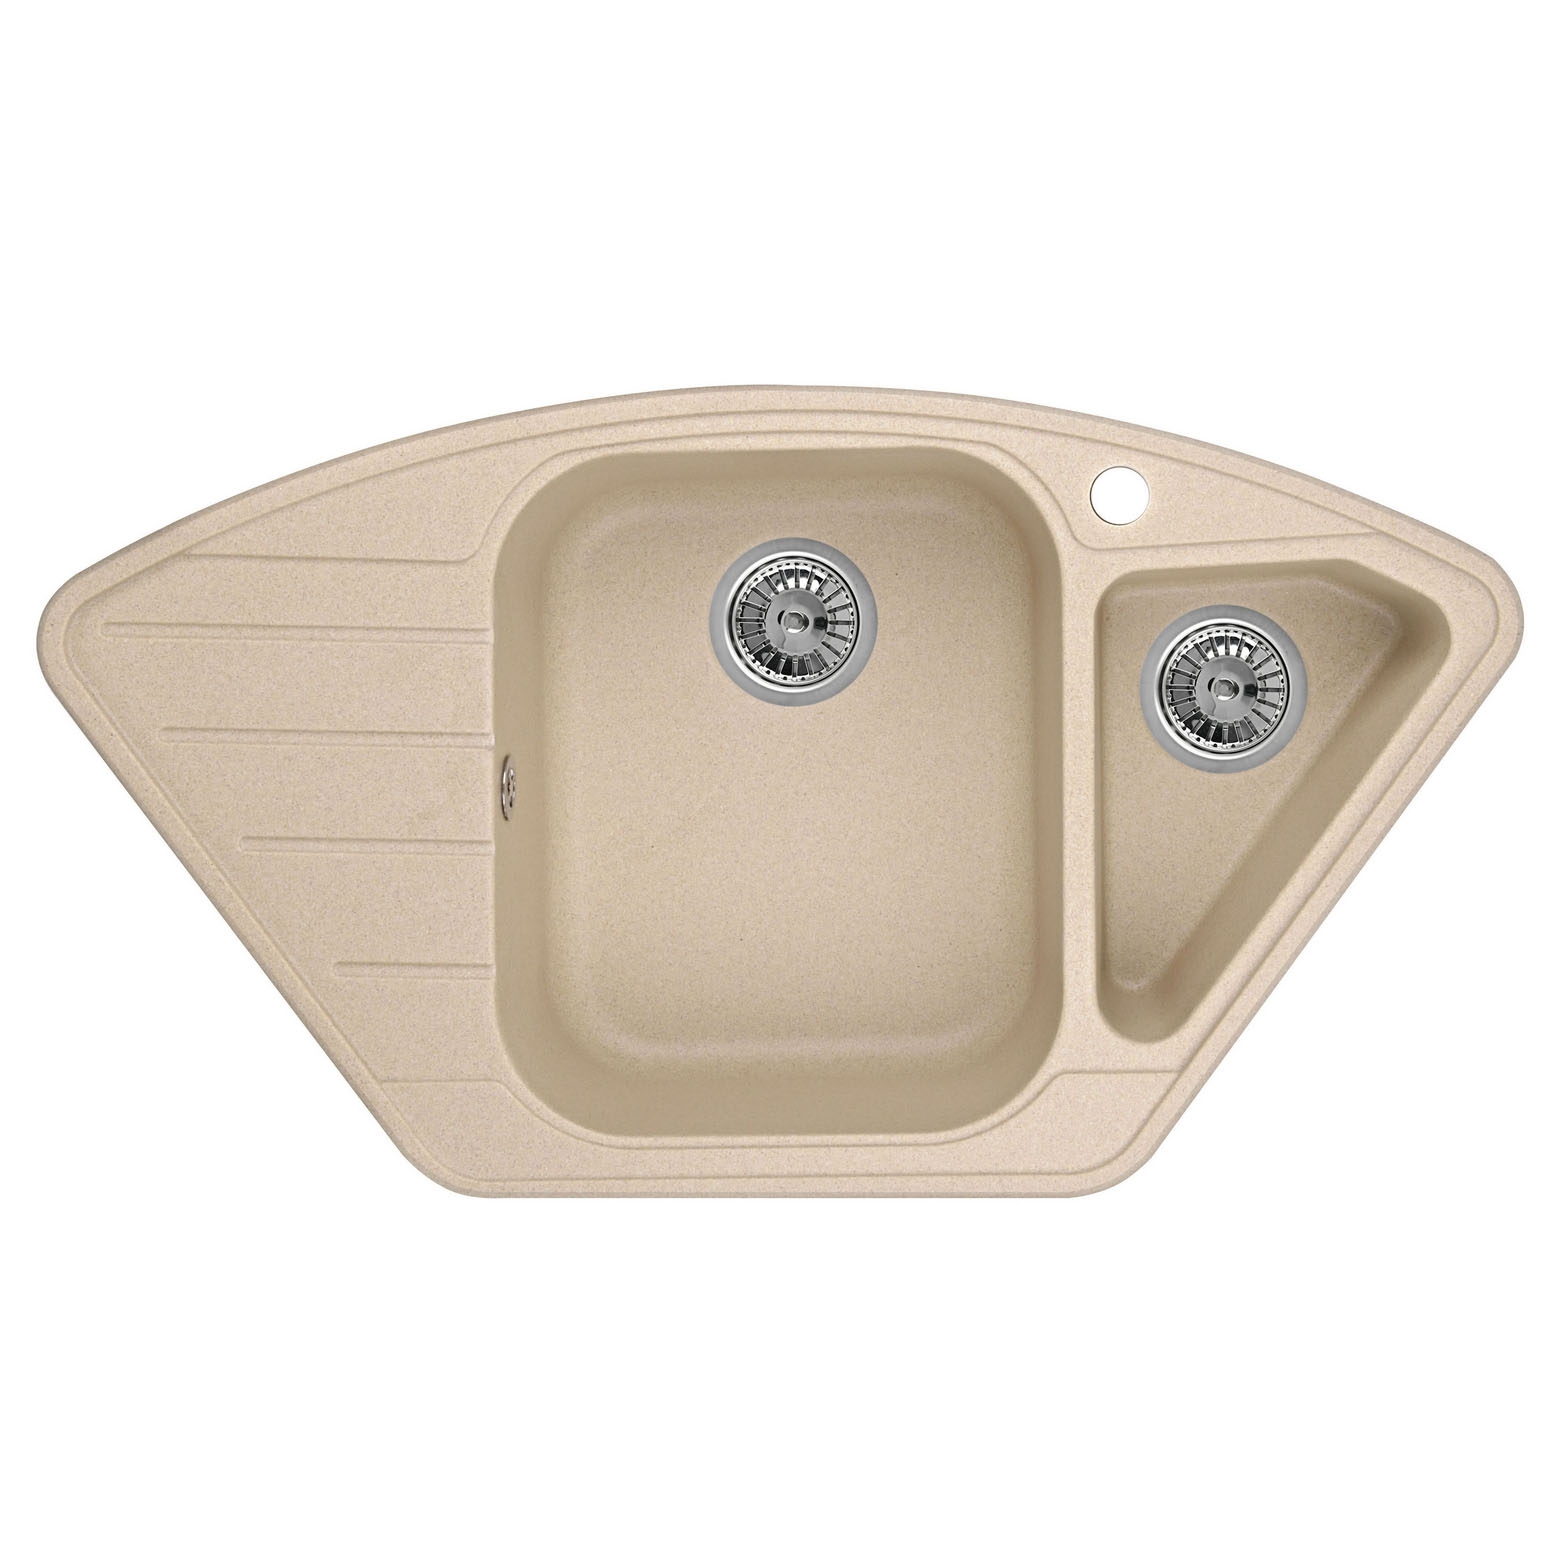 Кухонная мойка Granula GR-9101 890х490 песок посуда кухонная